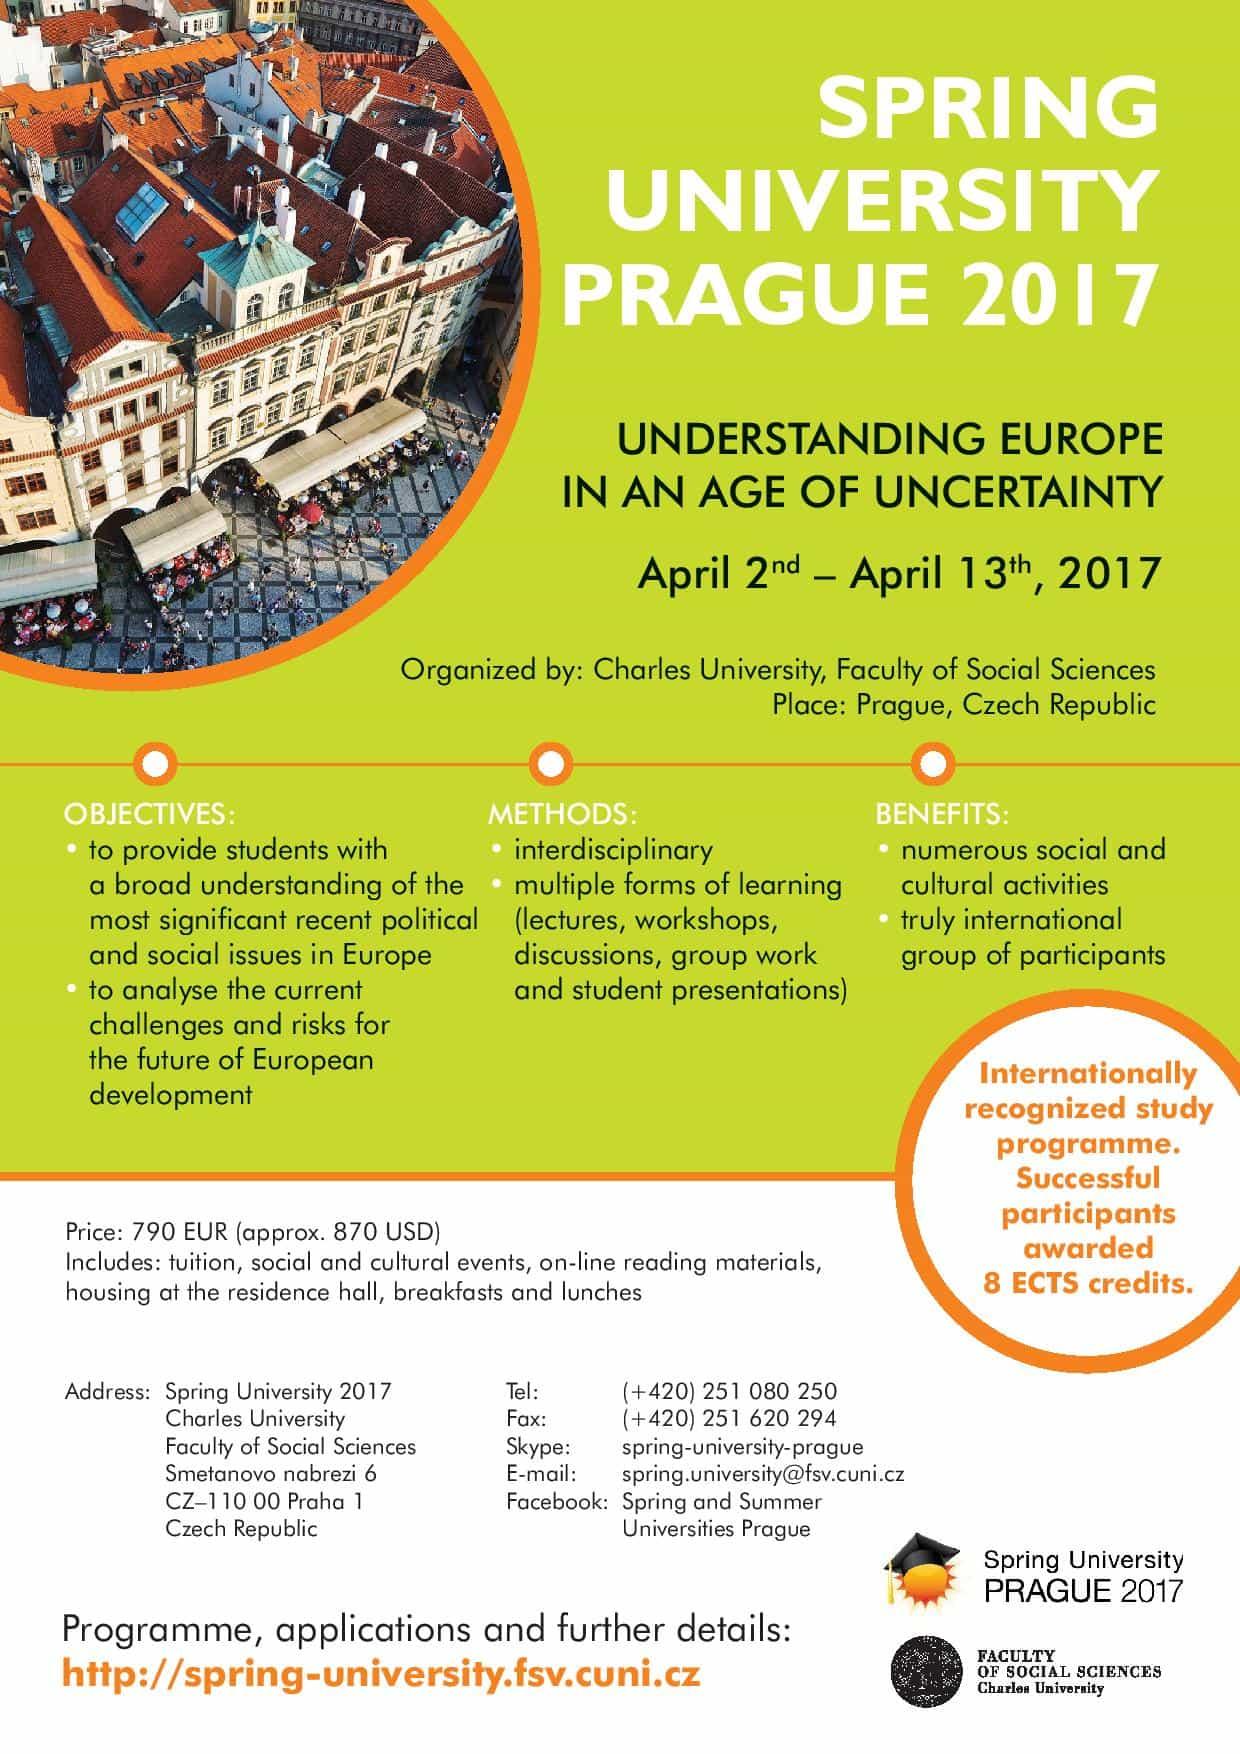 charles-university-spring-university-prague-2017-page-001